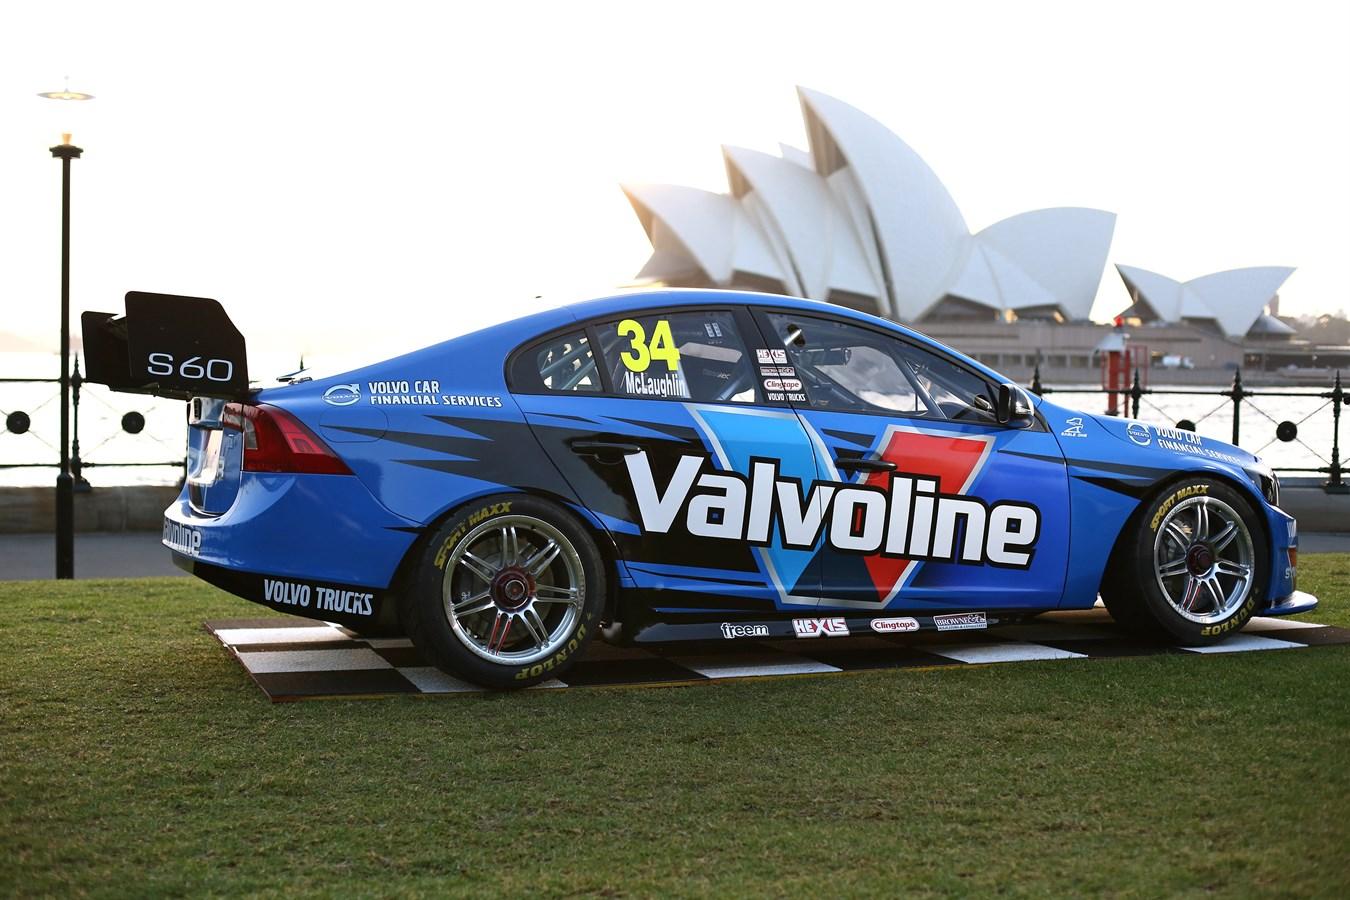 Volvo S60 V8 Supercar makes its debut in Sydney